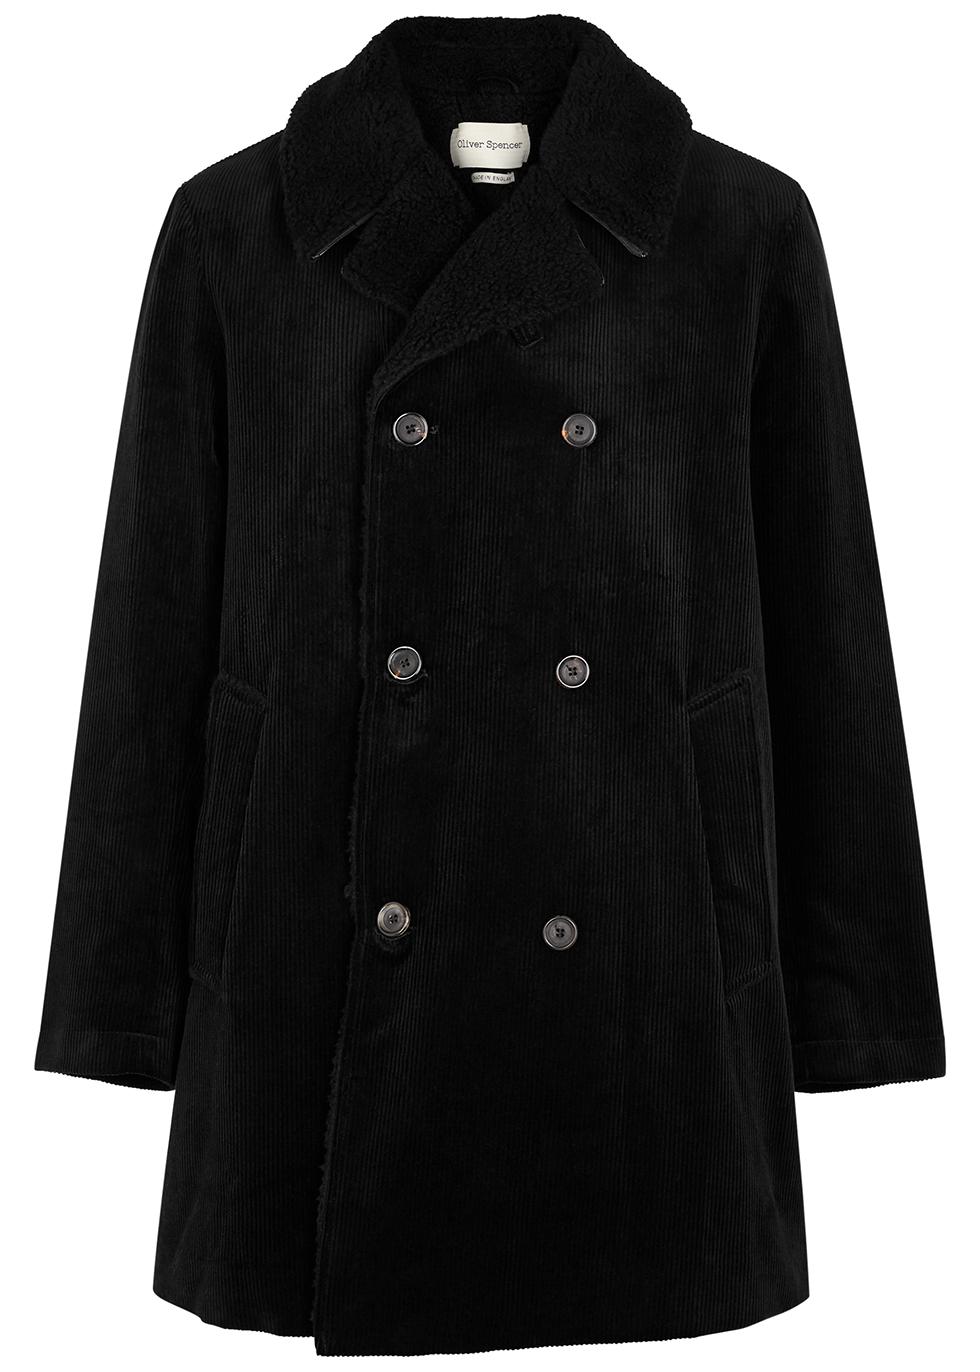 Newington black corduroy coat